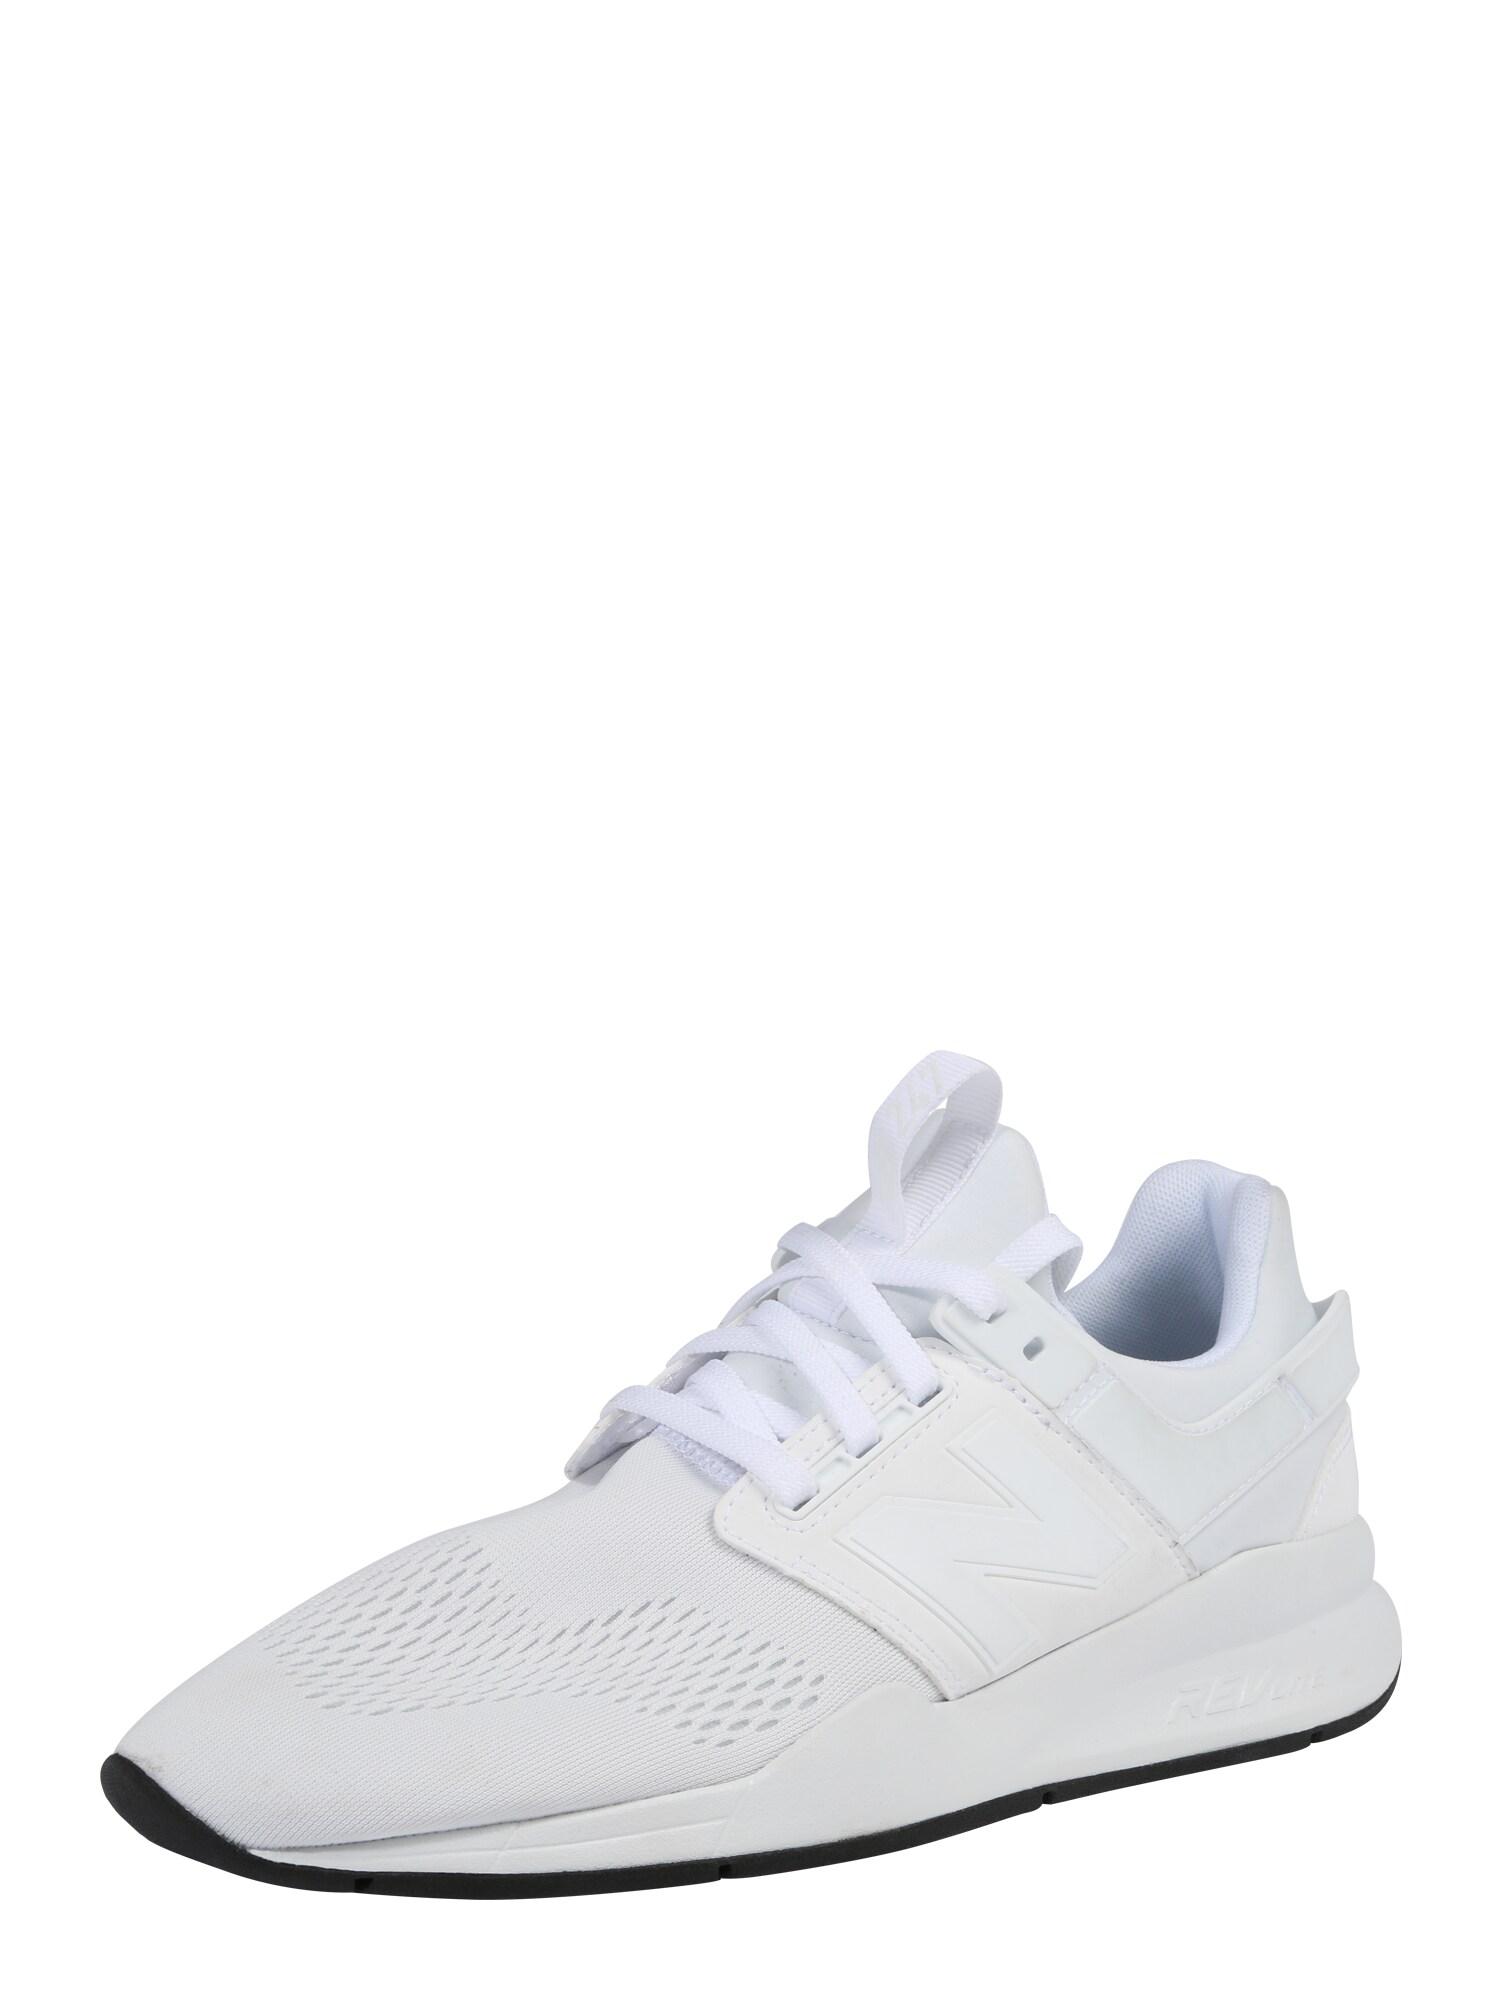 New Balance, Heren Sneakers laag 'MS247', wit